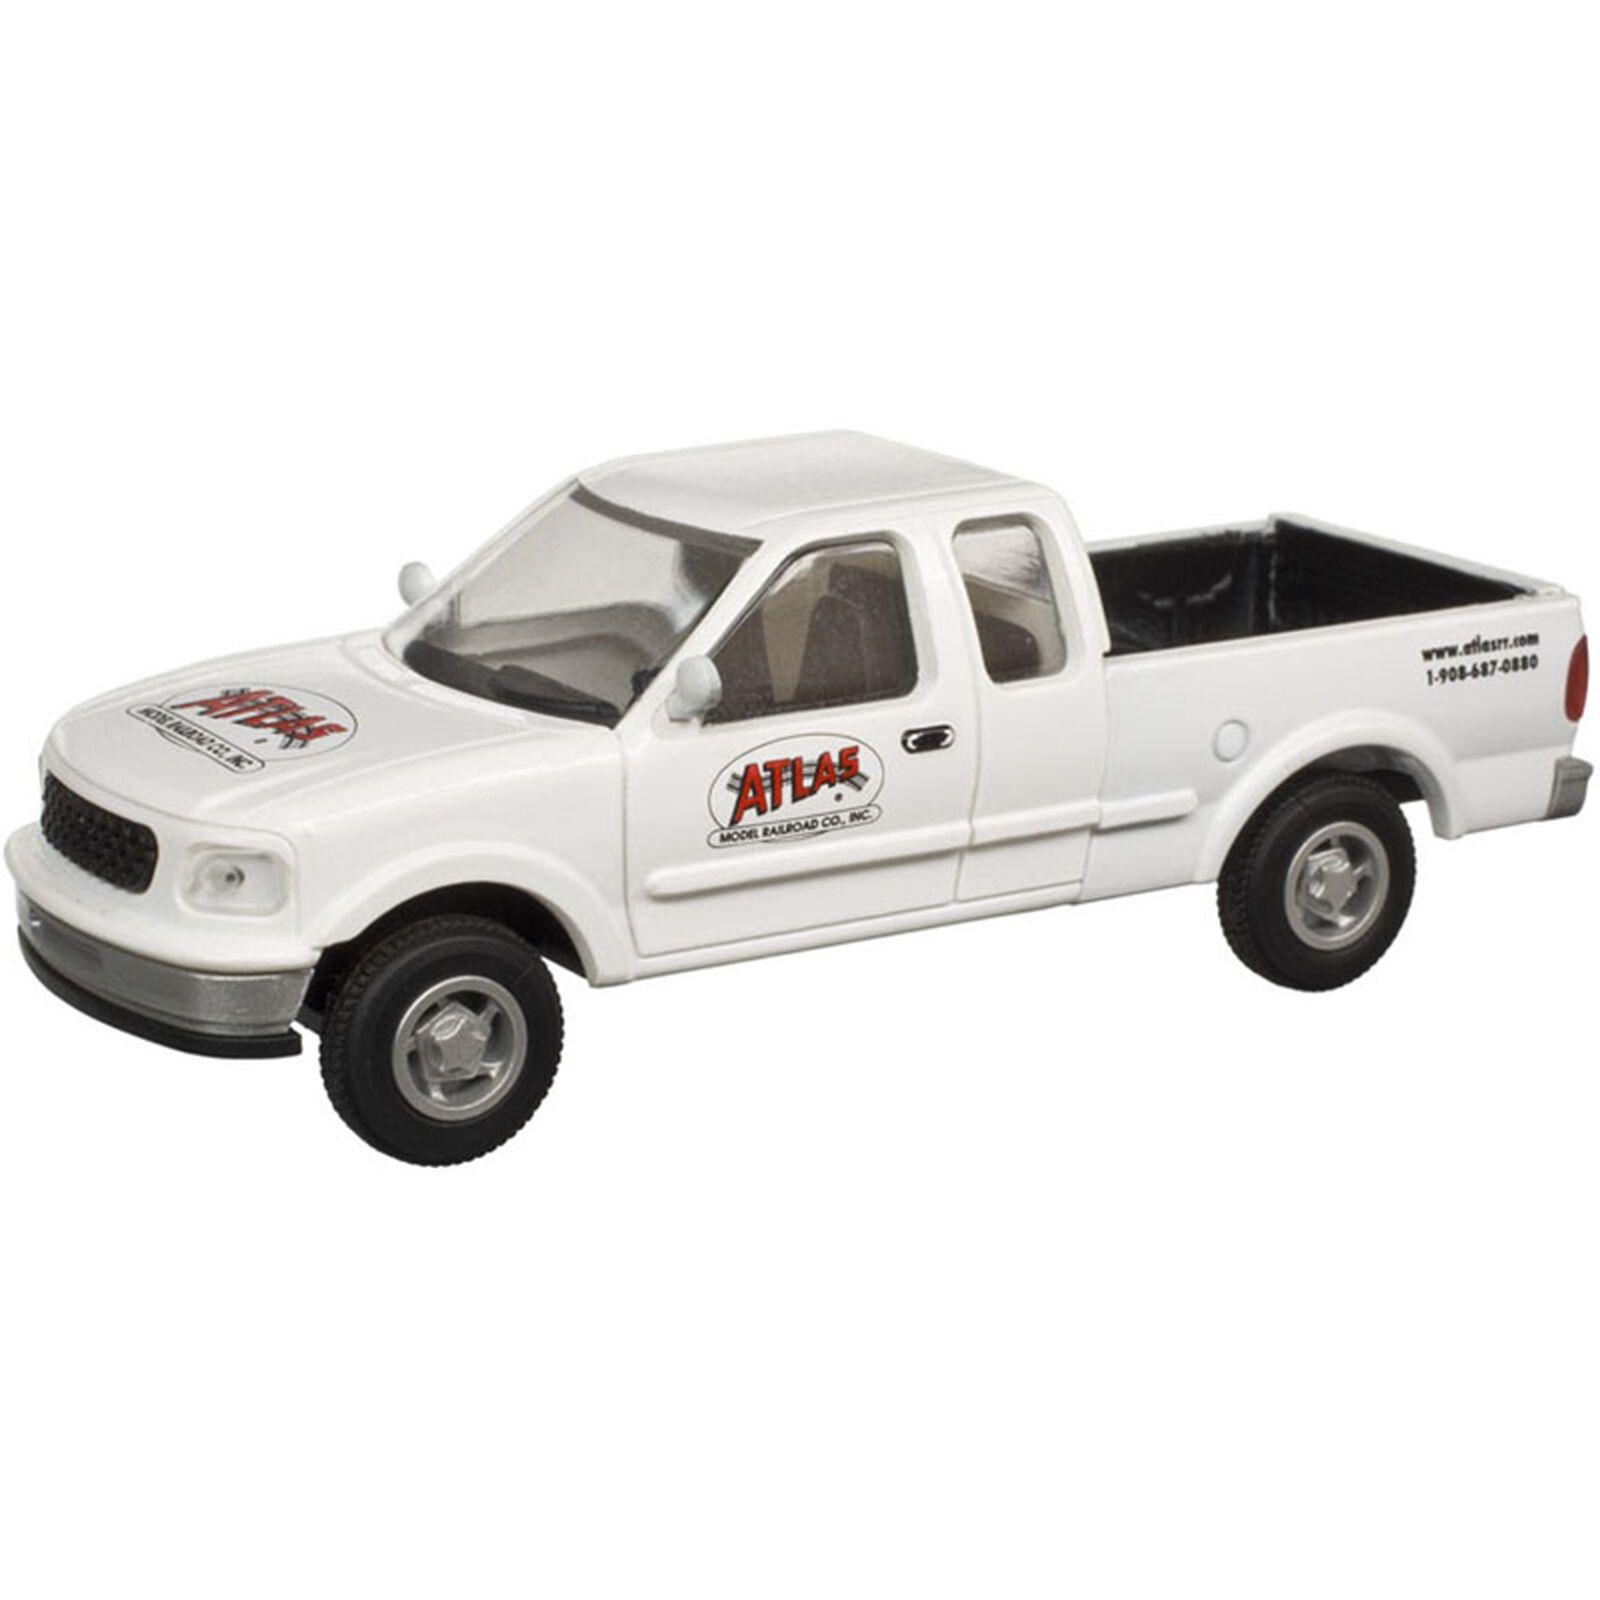 HO Ford F-150 Pick Up Atlas Model RR Company